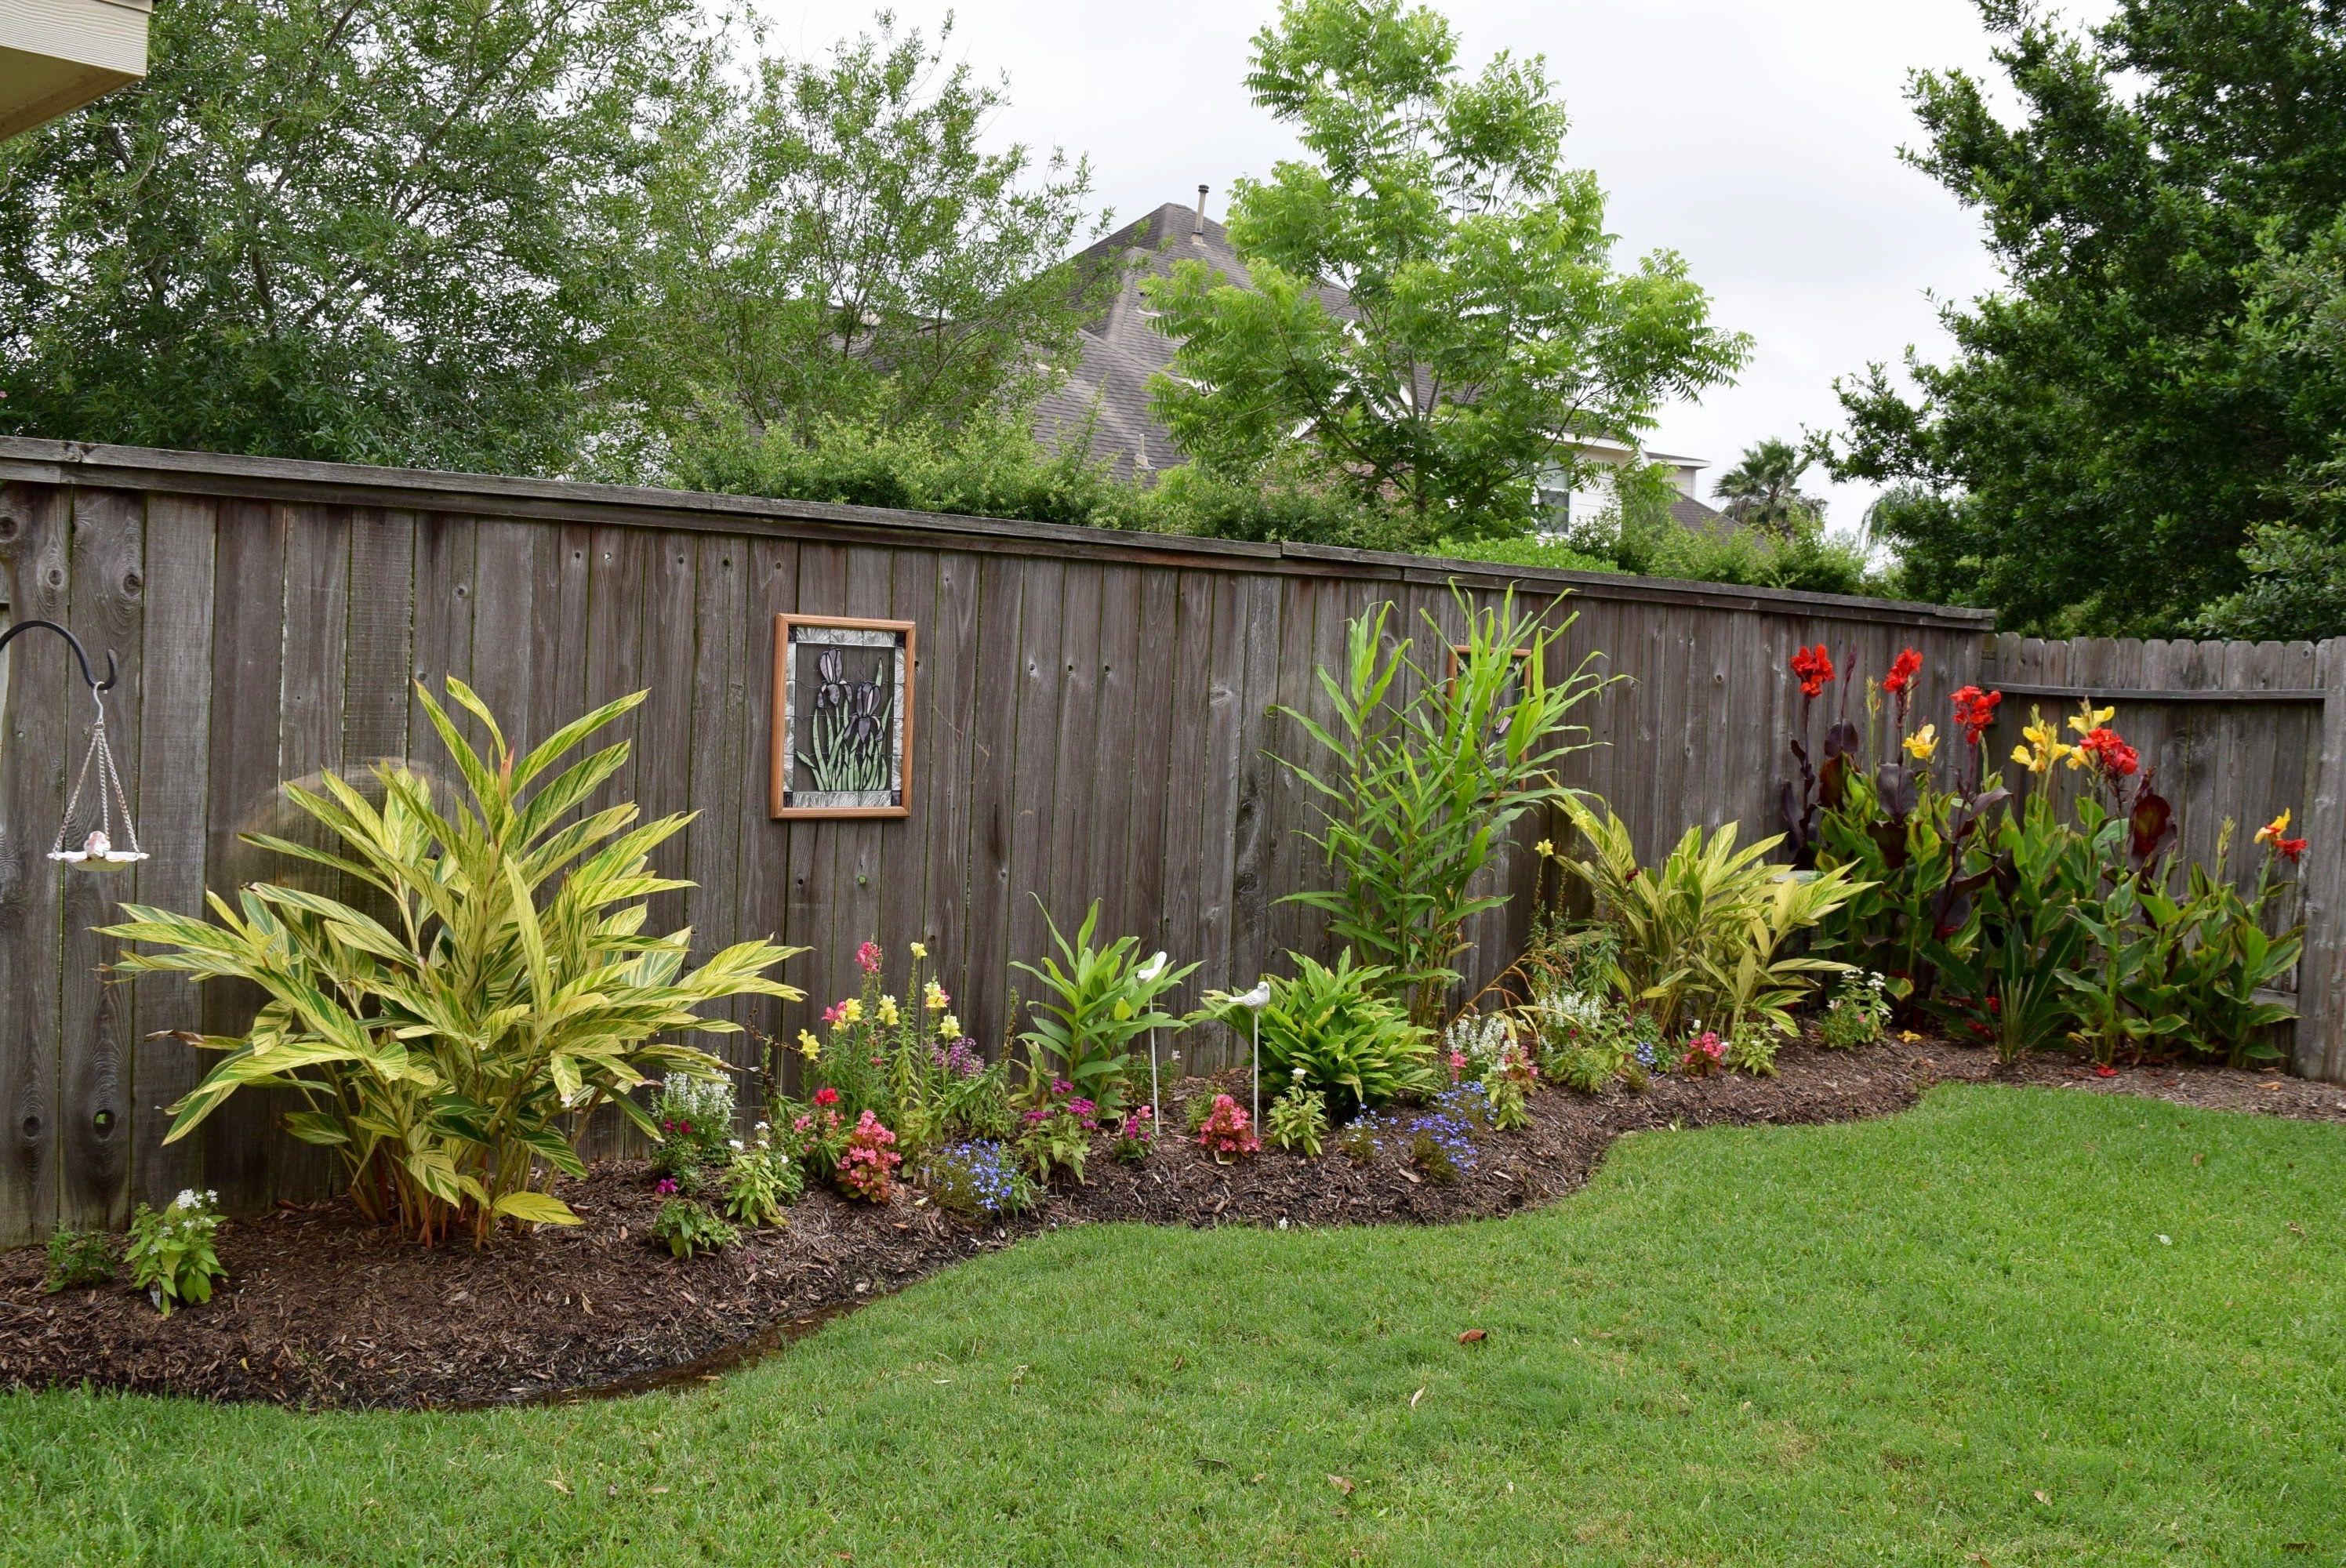 Pin On Garden Landscaping Ideas Backyard fence landscaping ideas